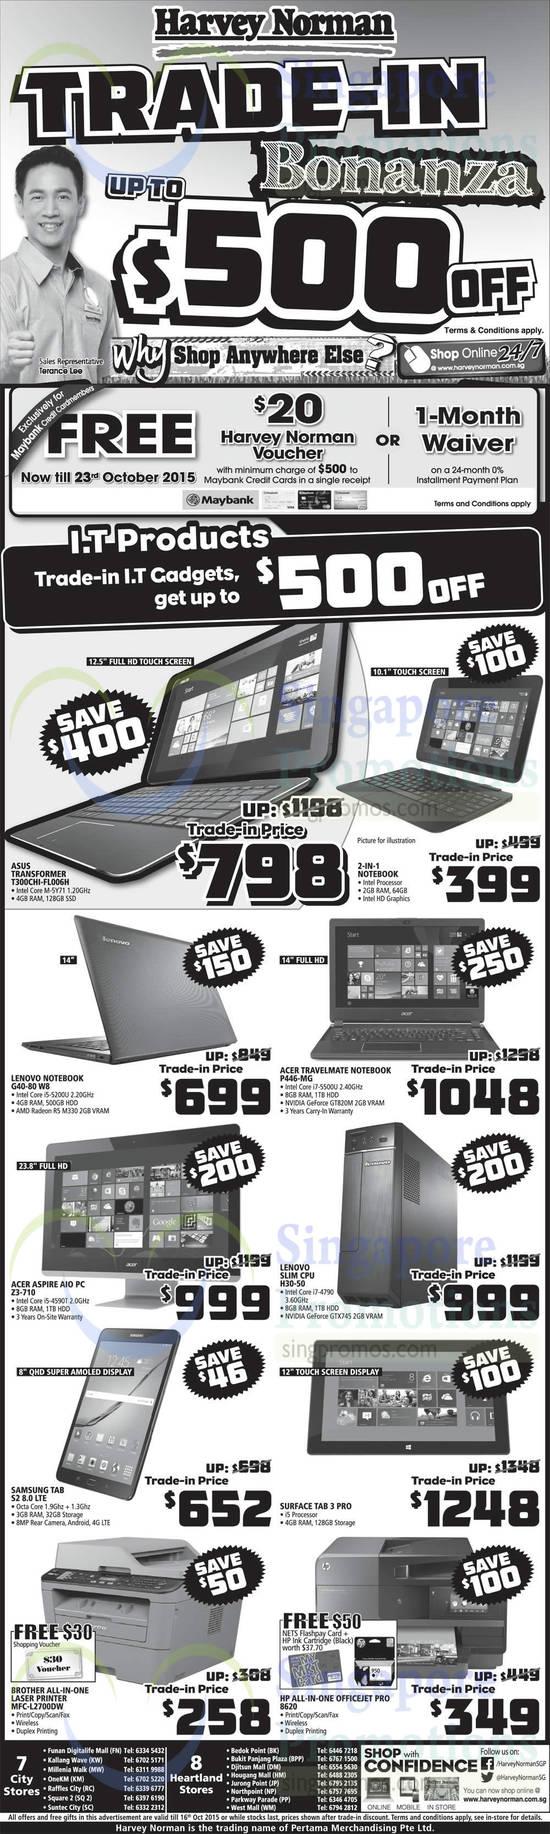 ASUS Transformer T300CHI-FL006H Notebook, Lenovo G40-80 W8 Notebook, Acer P446-MG Notebook, Acer Aspire Z3-710 AIO Desktop PC, Lenovo H30-50 CPU, Samsung Galaxy Tab S2 8.0, Microsoft Surface Tab 3 Pro, Brother MFC-L2700DW Printer, HP 8620 Printer